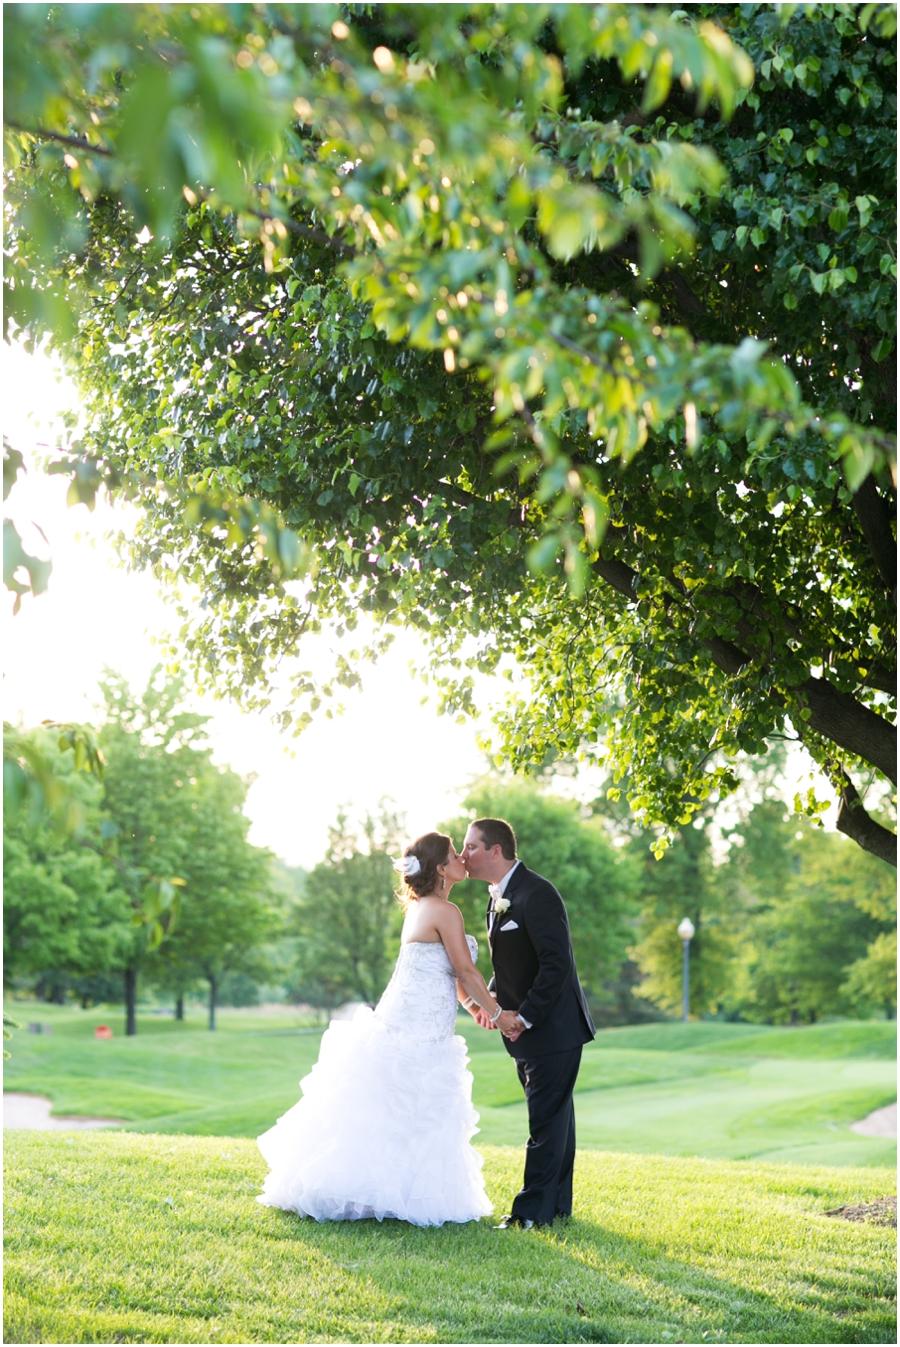 The Manor at Commonwealth Wedding - Horsham Wedding Photographer